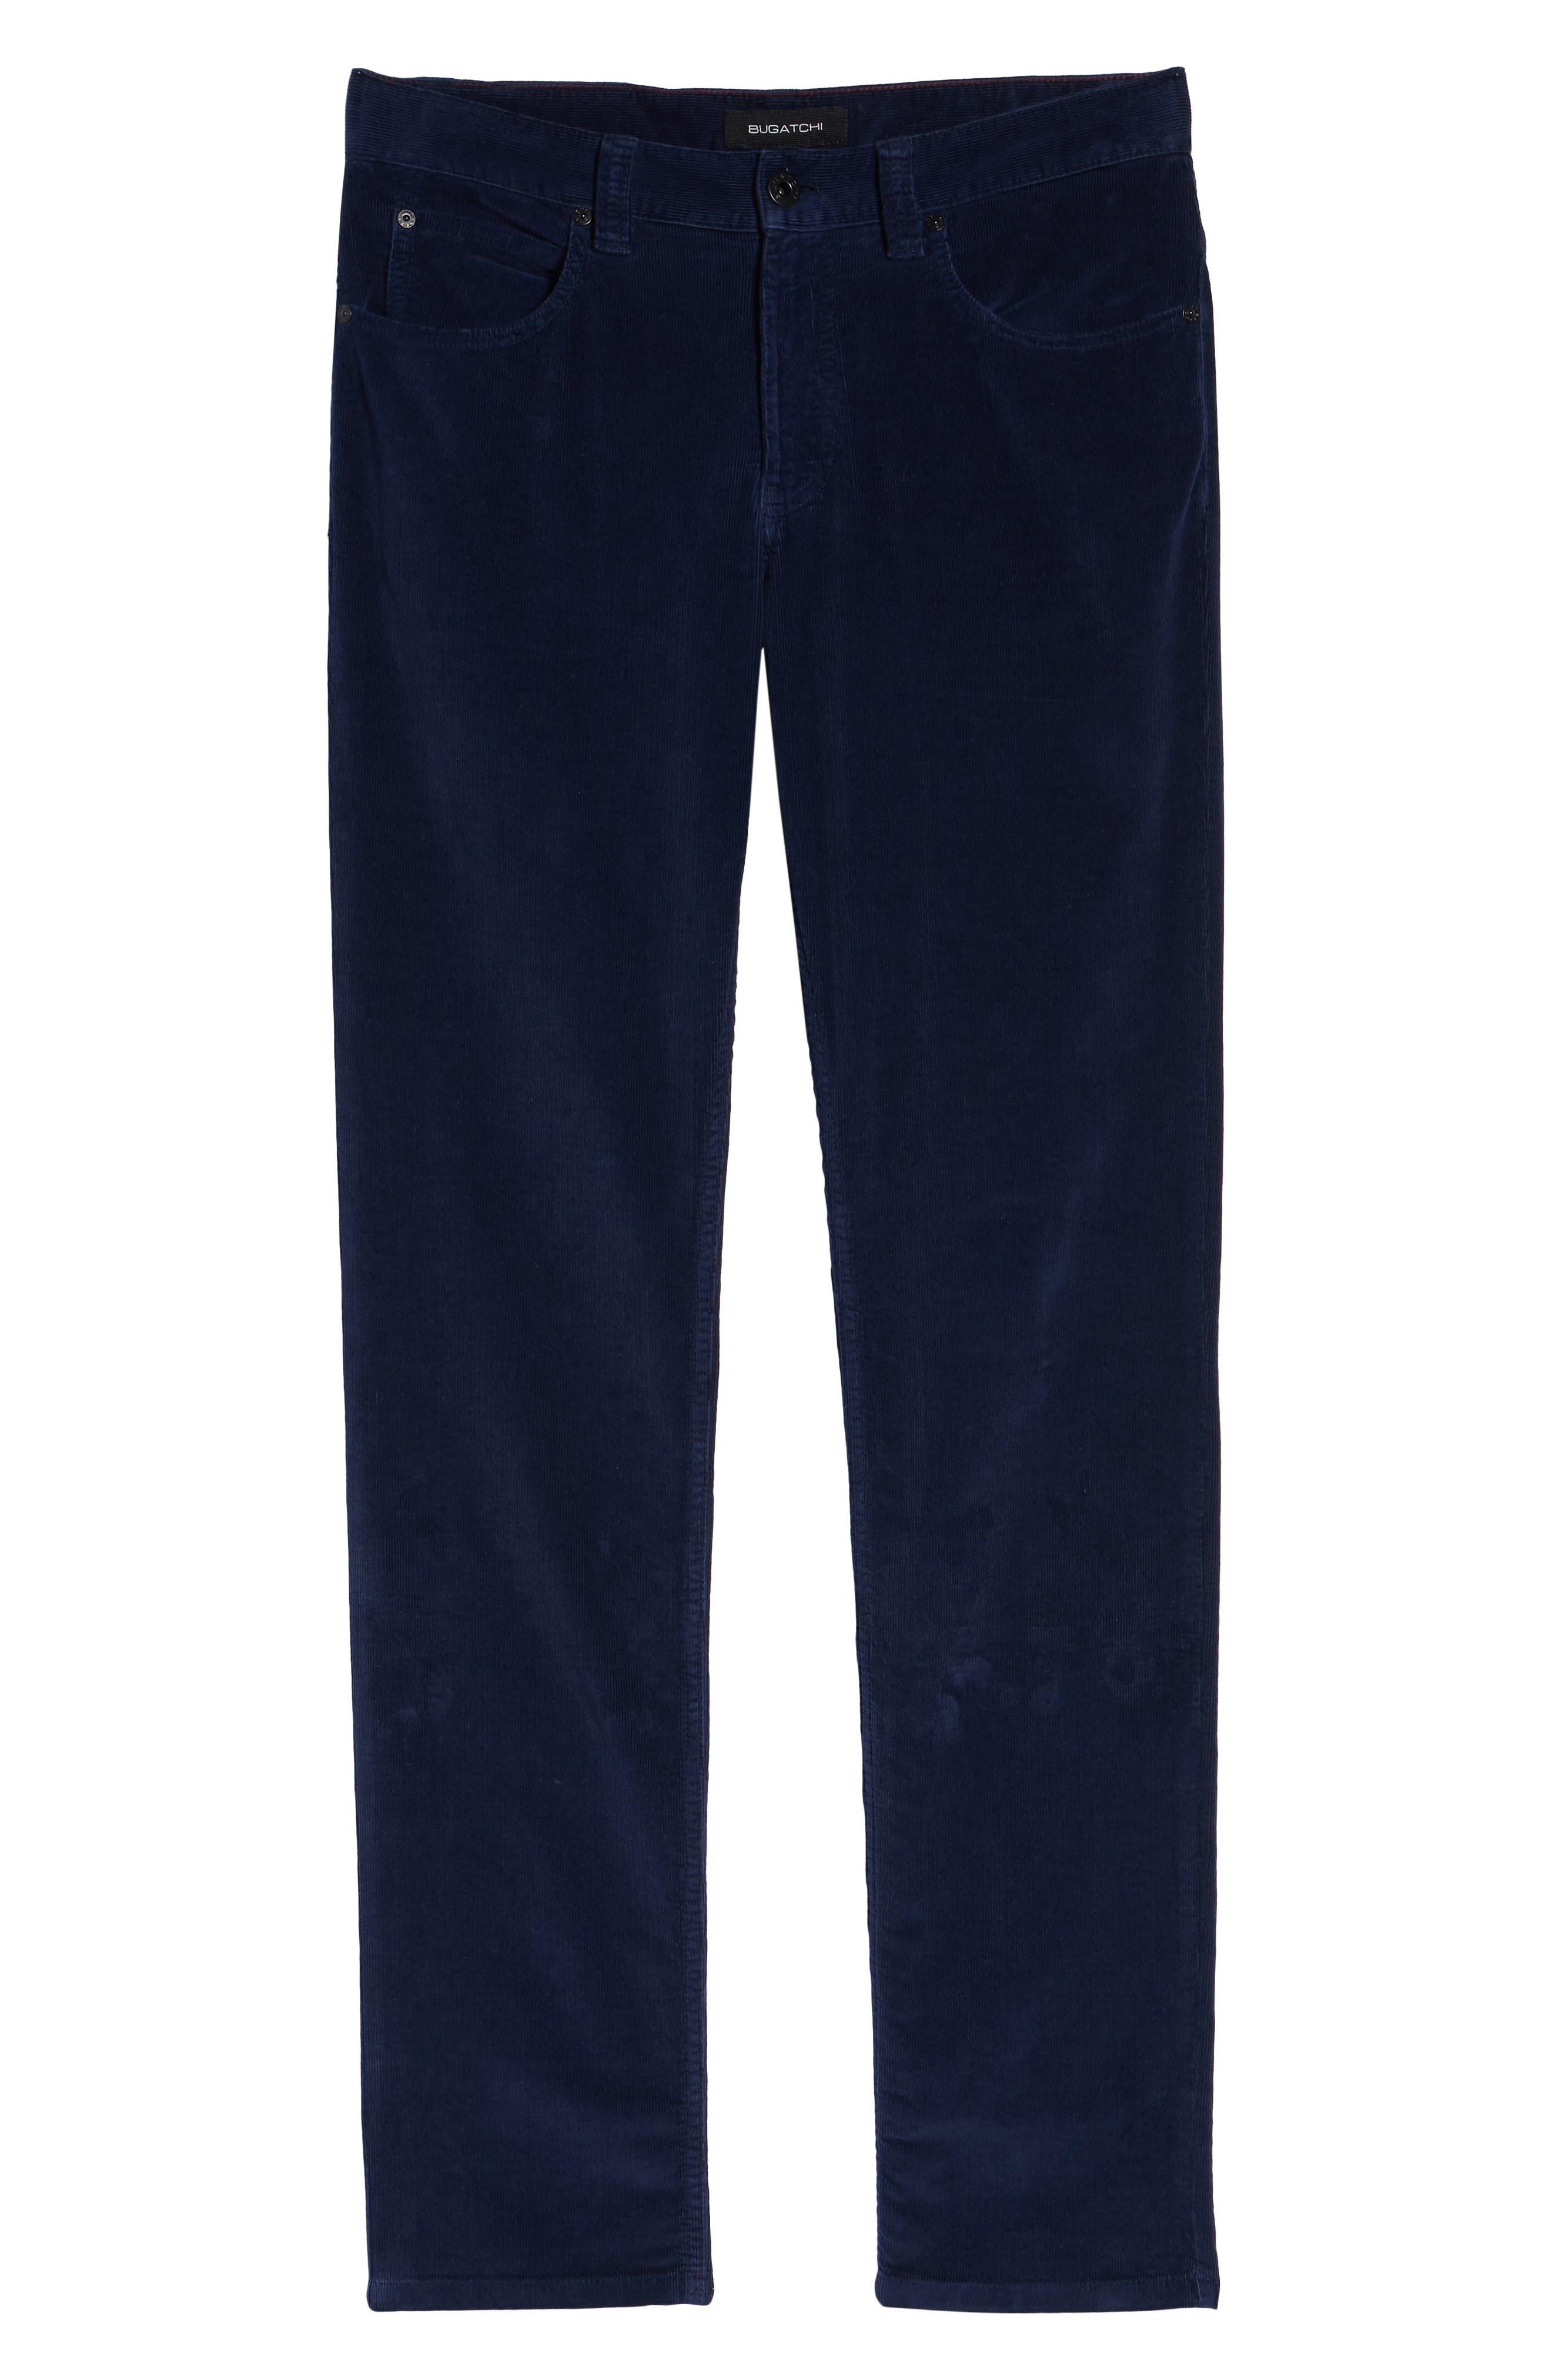 Slim Fit Corduroy Jeans,                             Alternate thumbnail 6, color,                             MIDNIGHT